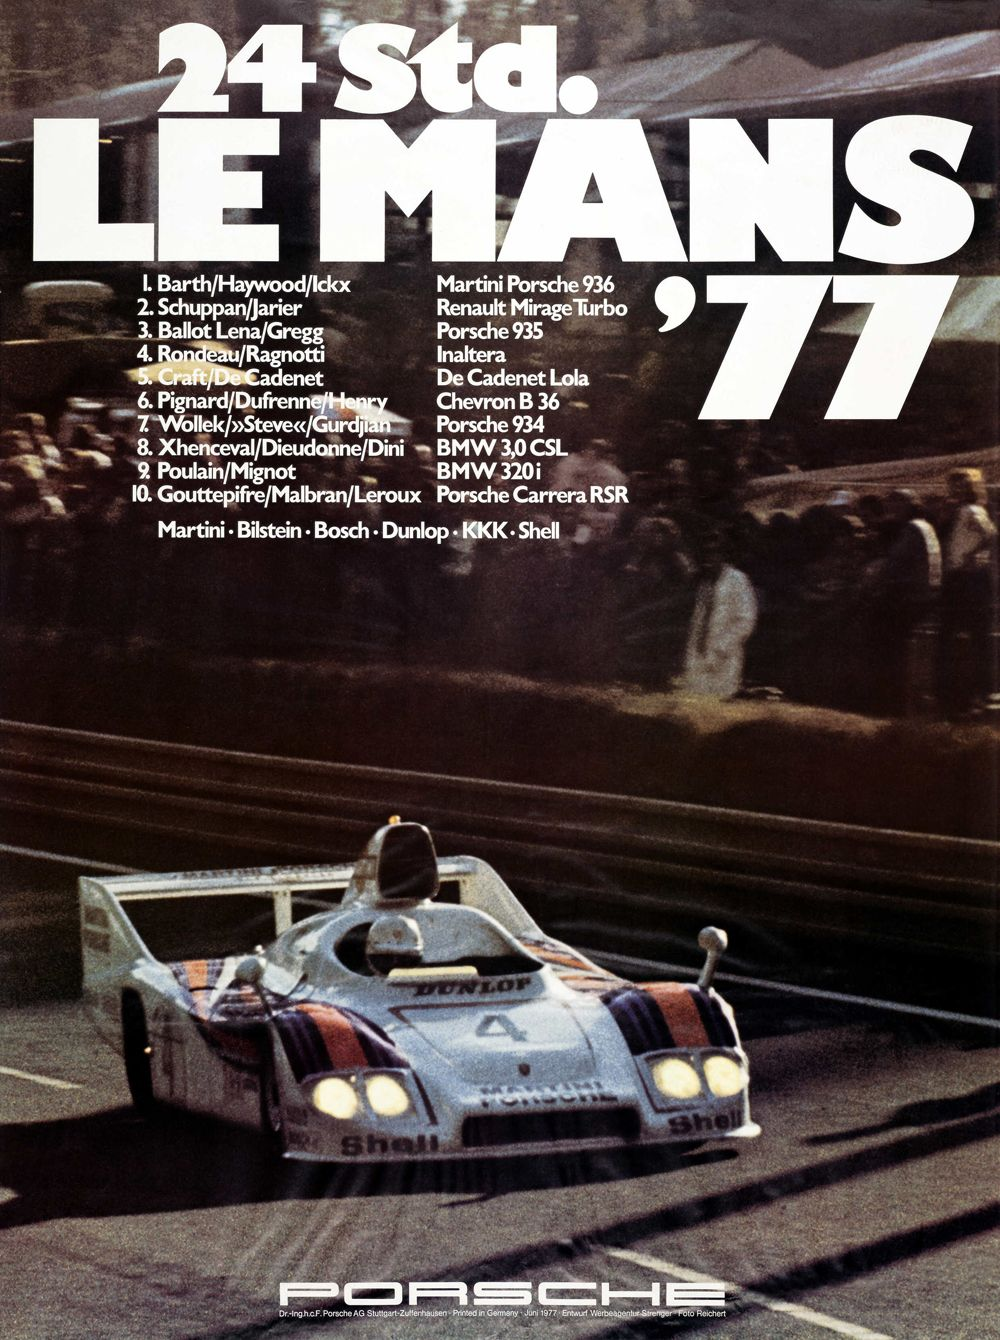 6 - PORSCHE - 24h de Le Mans 1977